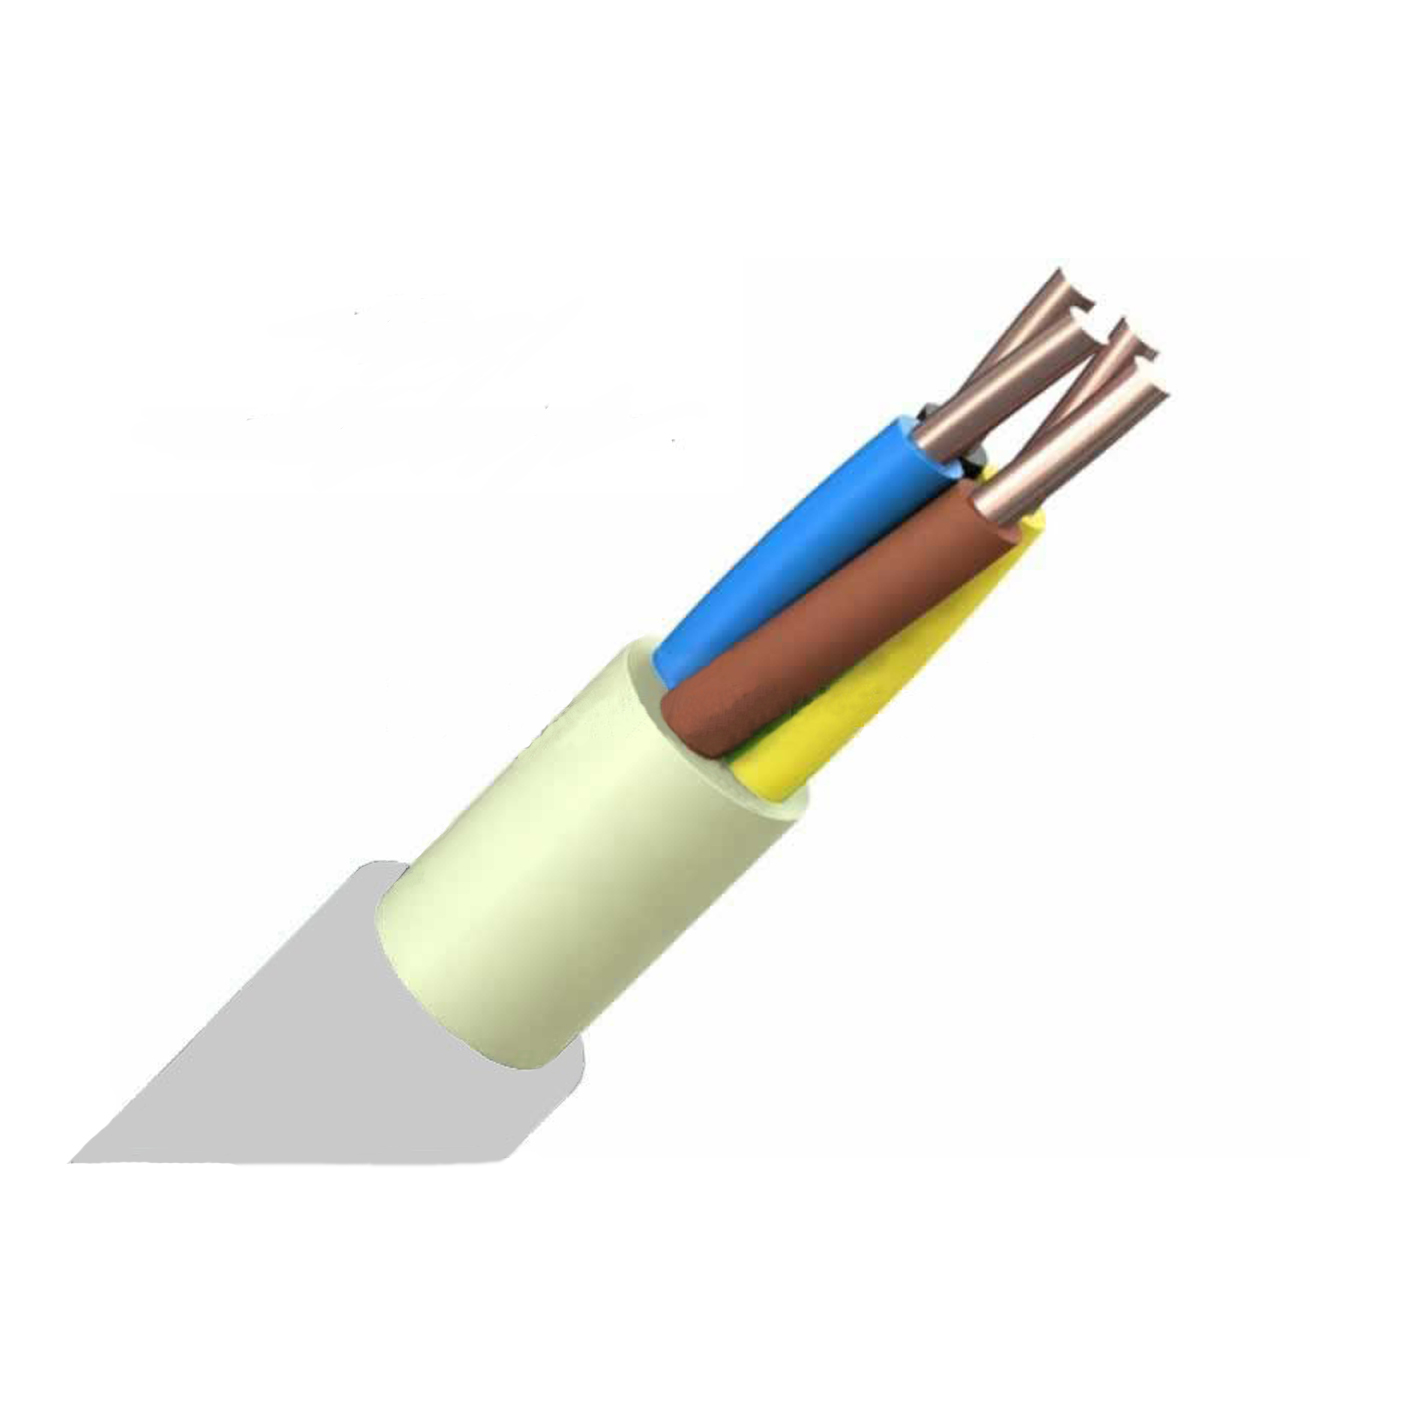 Öznur 4x1.5 NYM (NVV) Kablo